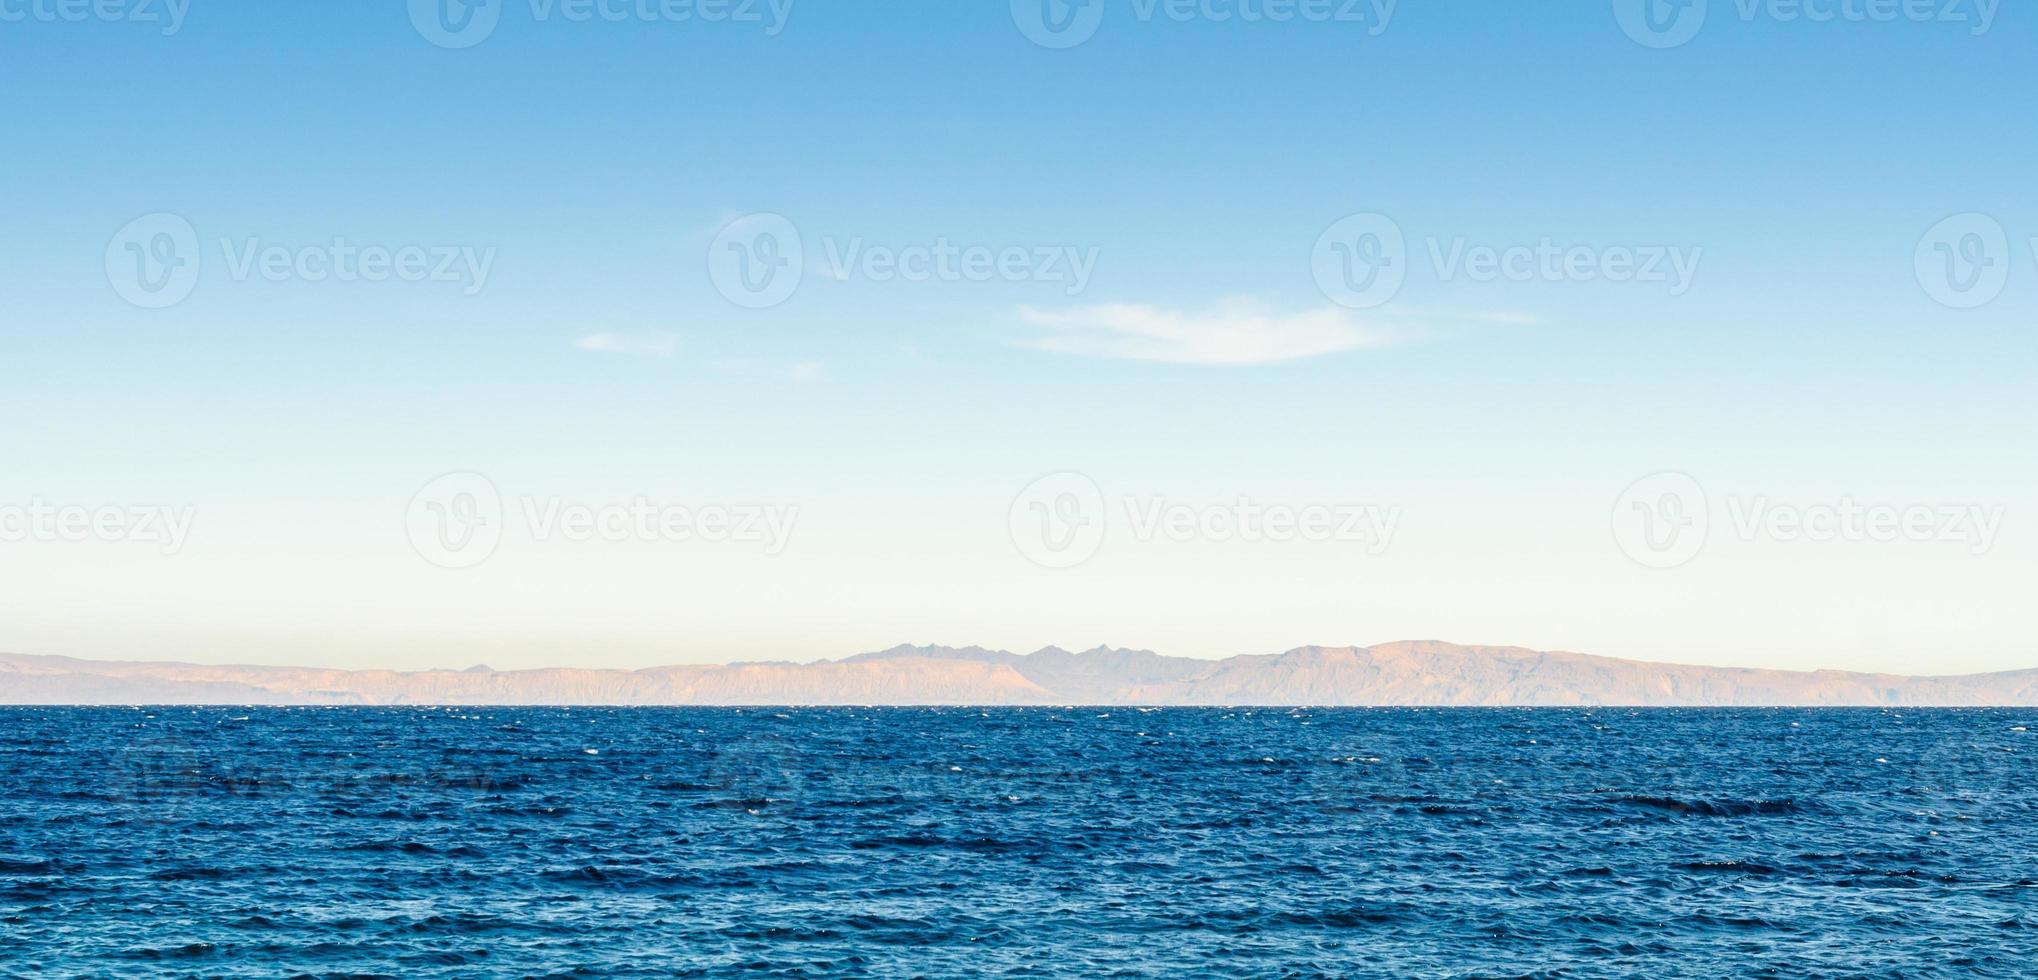 agua con montañas al fondo foto